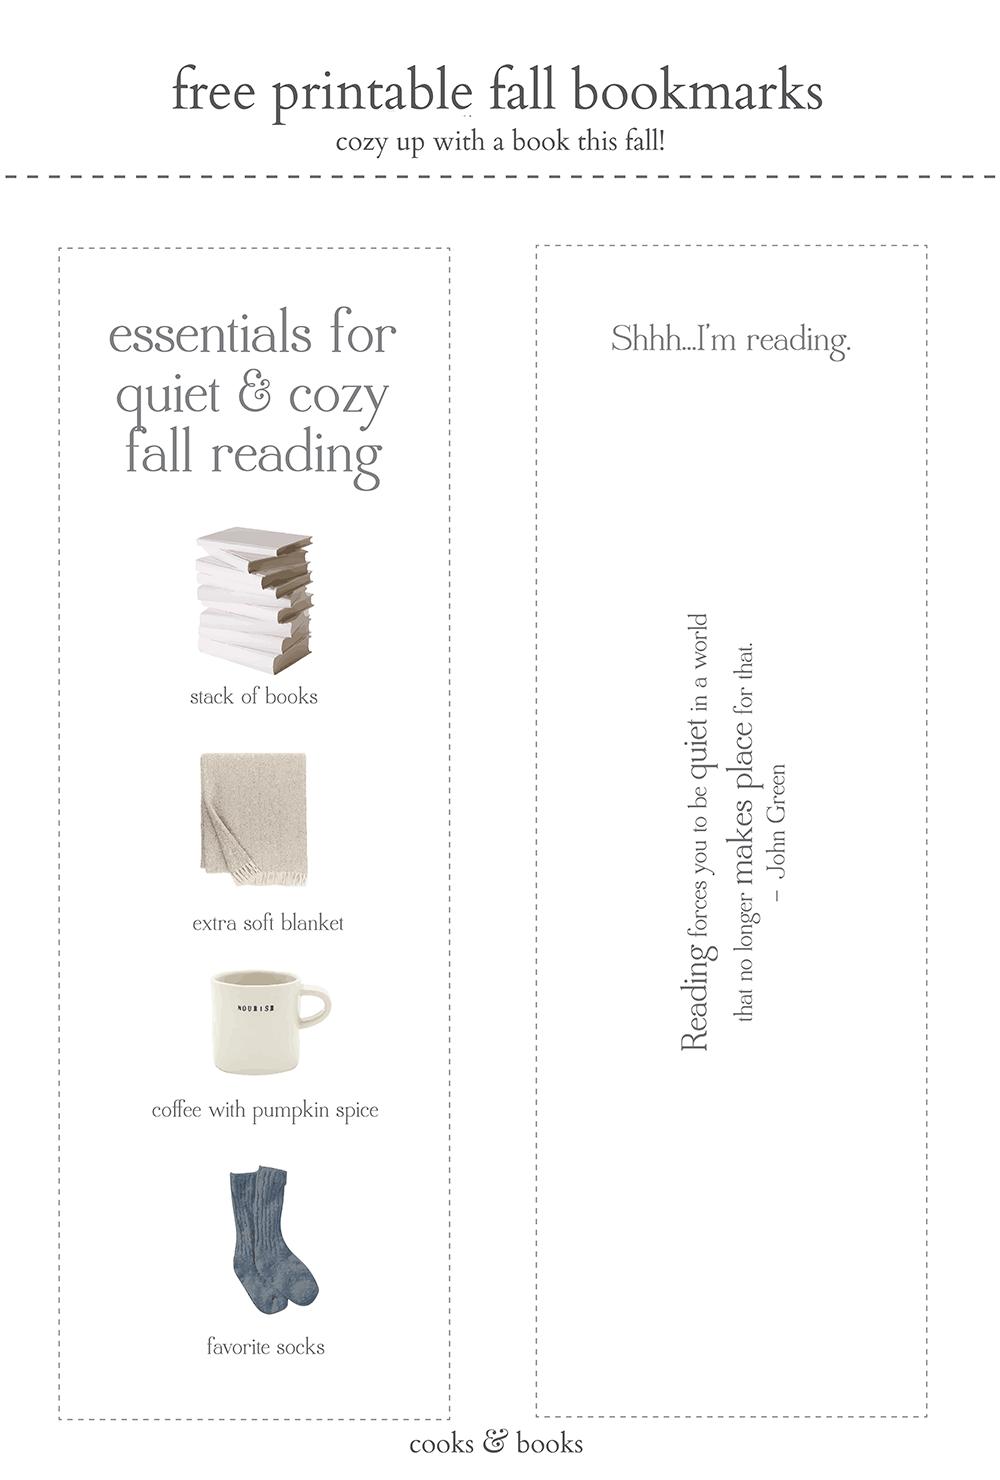 free printable fall bookmarks